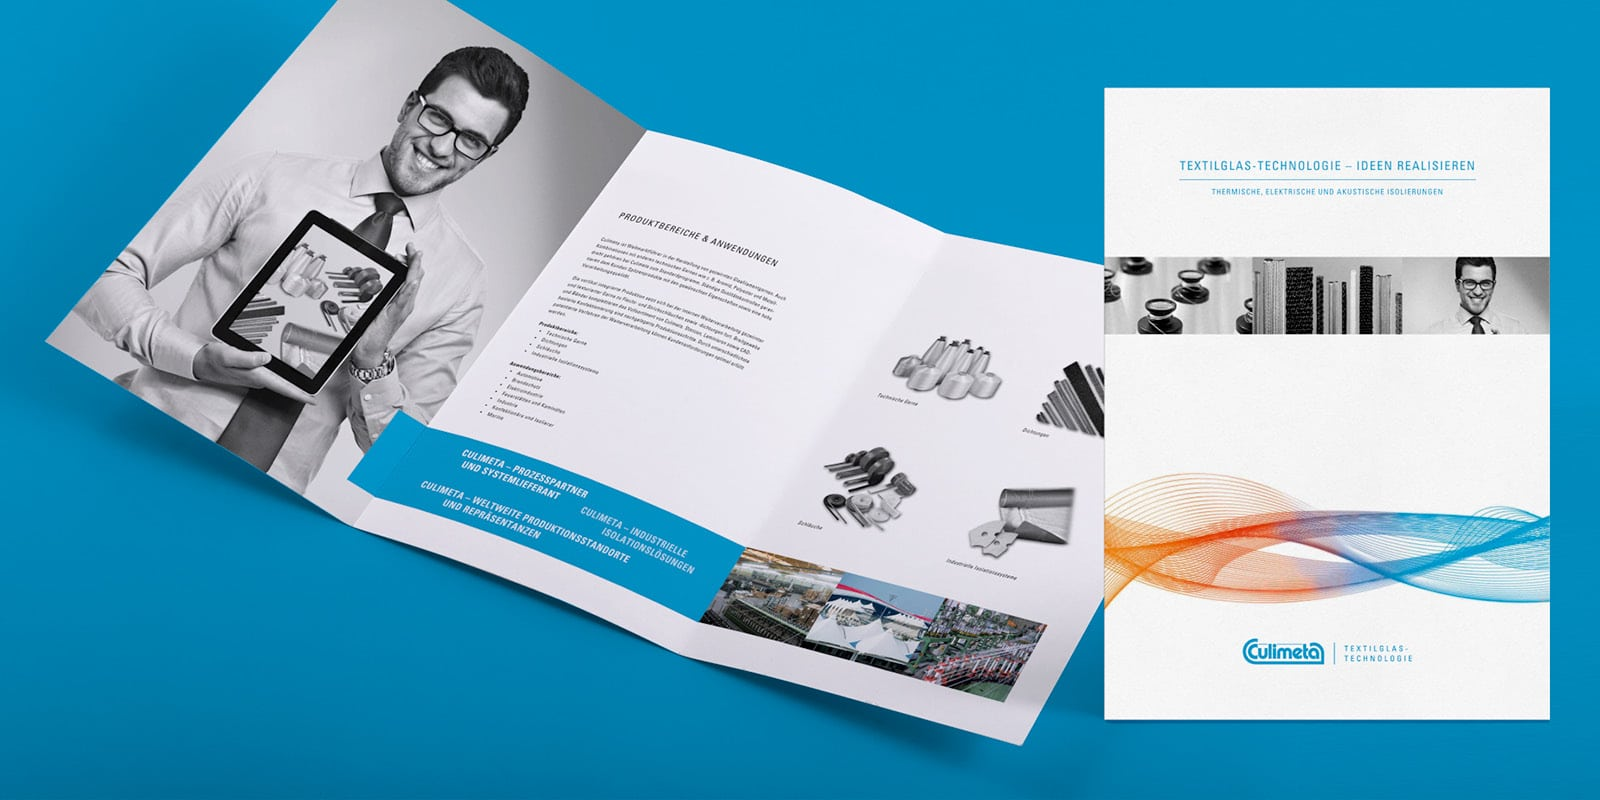 Culimeta – Imagebroschüre Textilglas